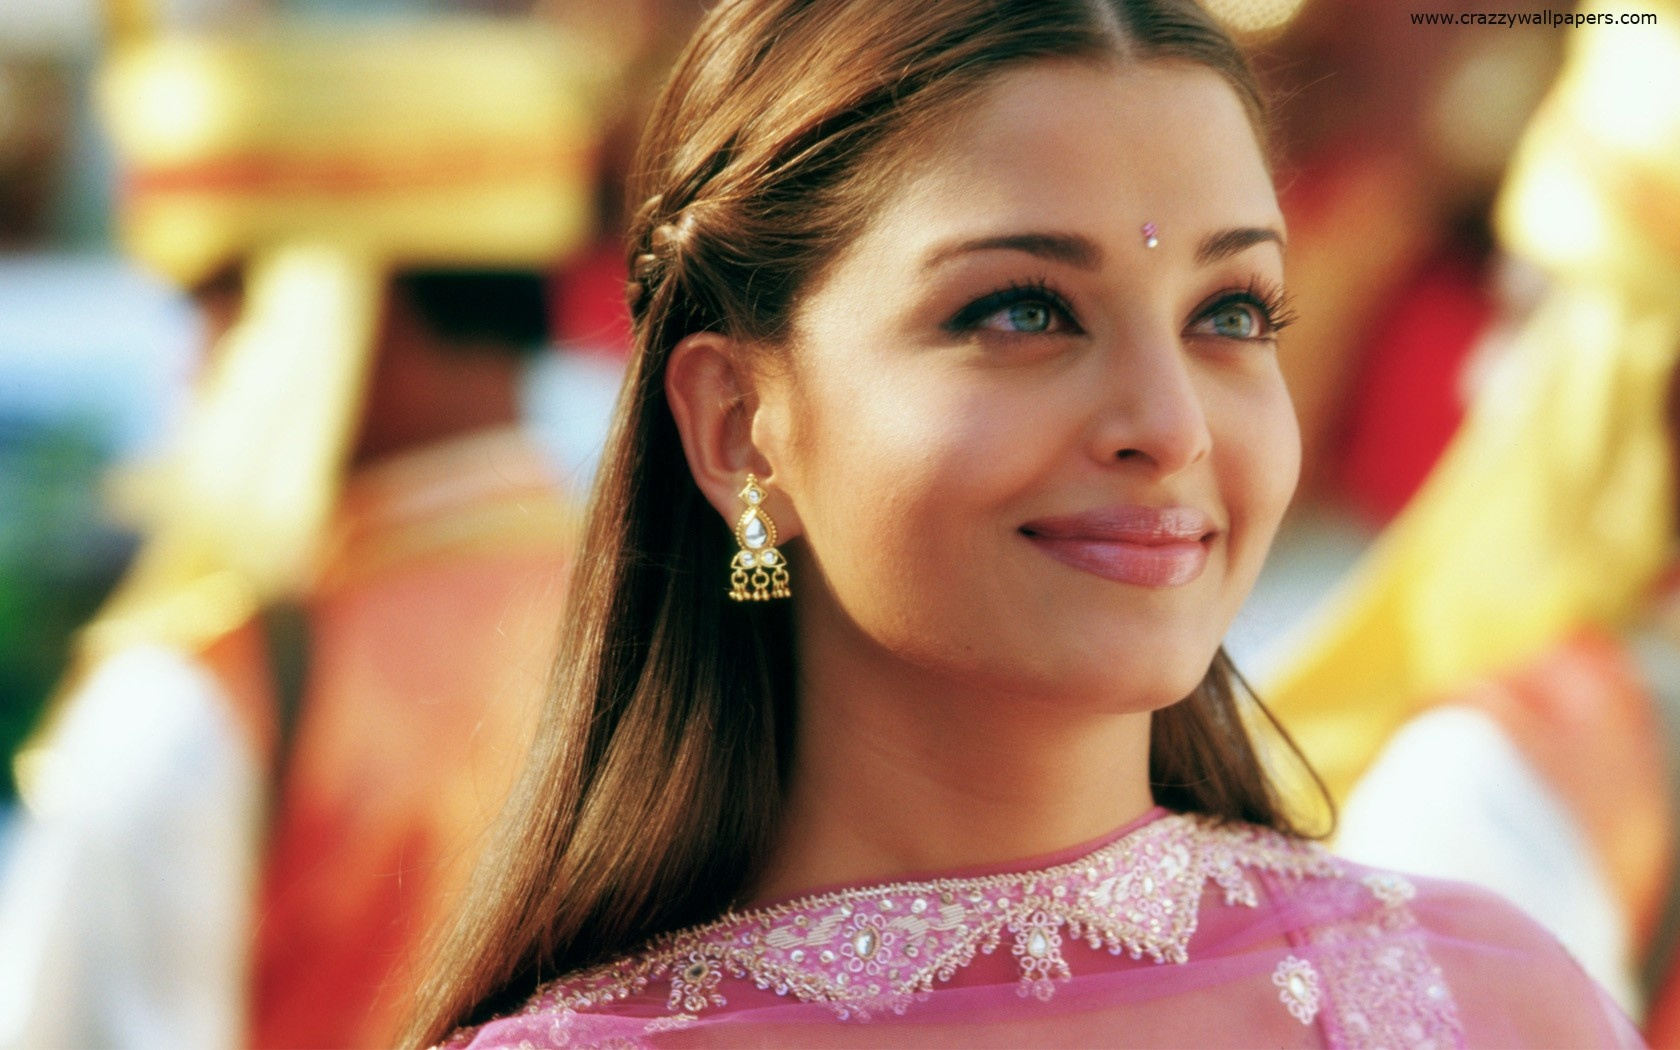 aishwarya rai high quality widescreen wallpapers in jpg format for